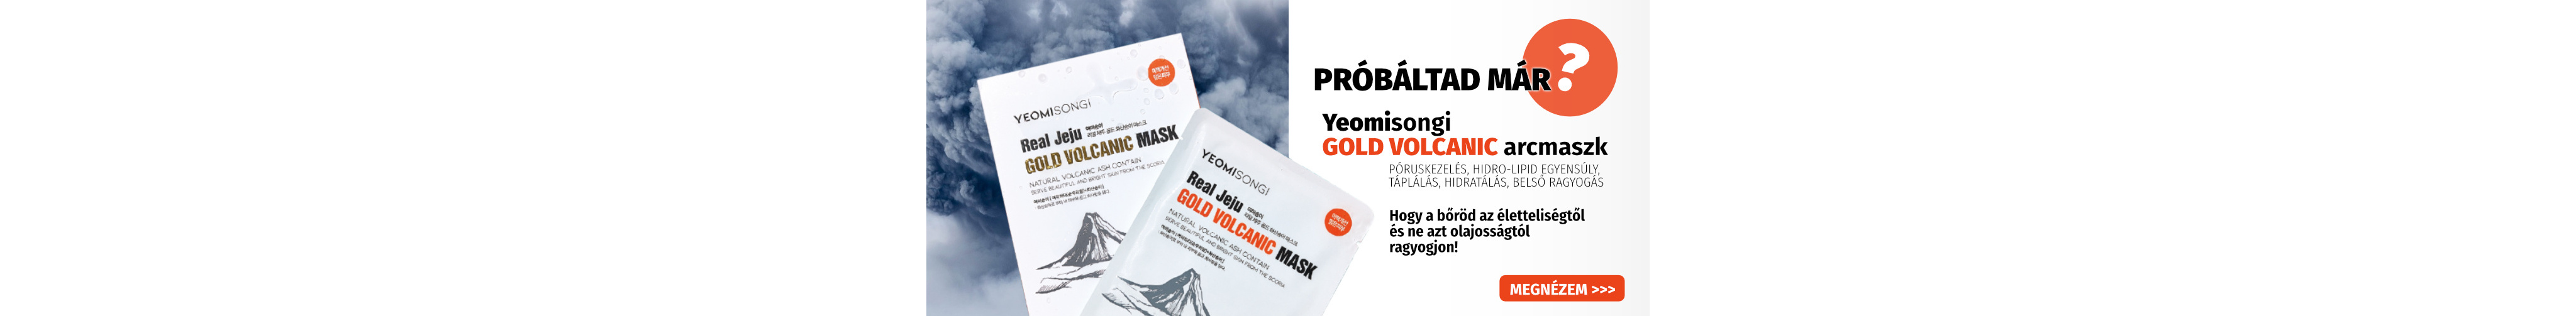 Yeomi-songi-gold-volcanic-arcmaszk